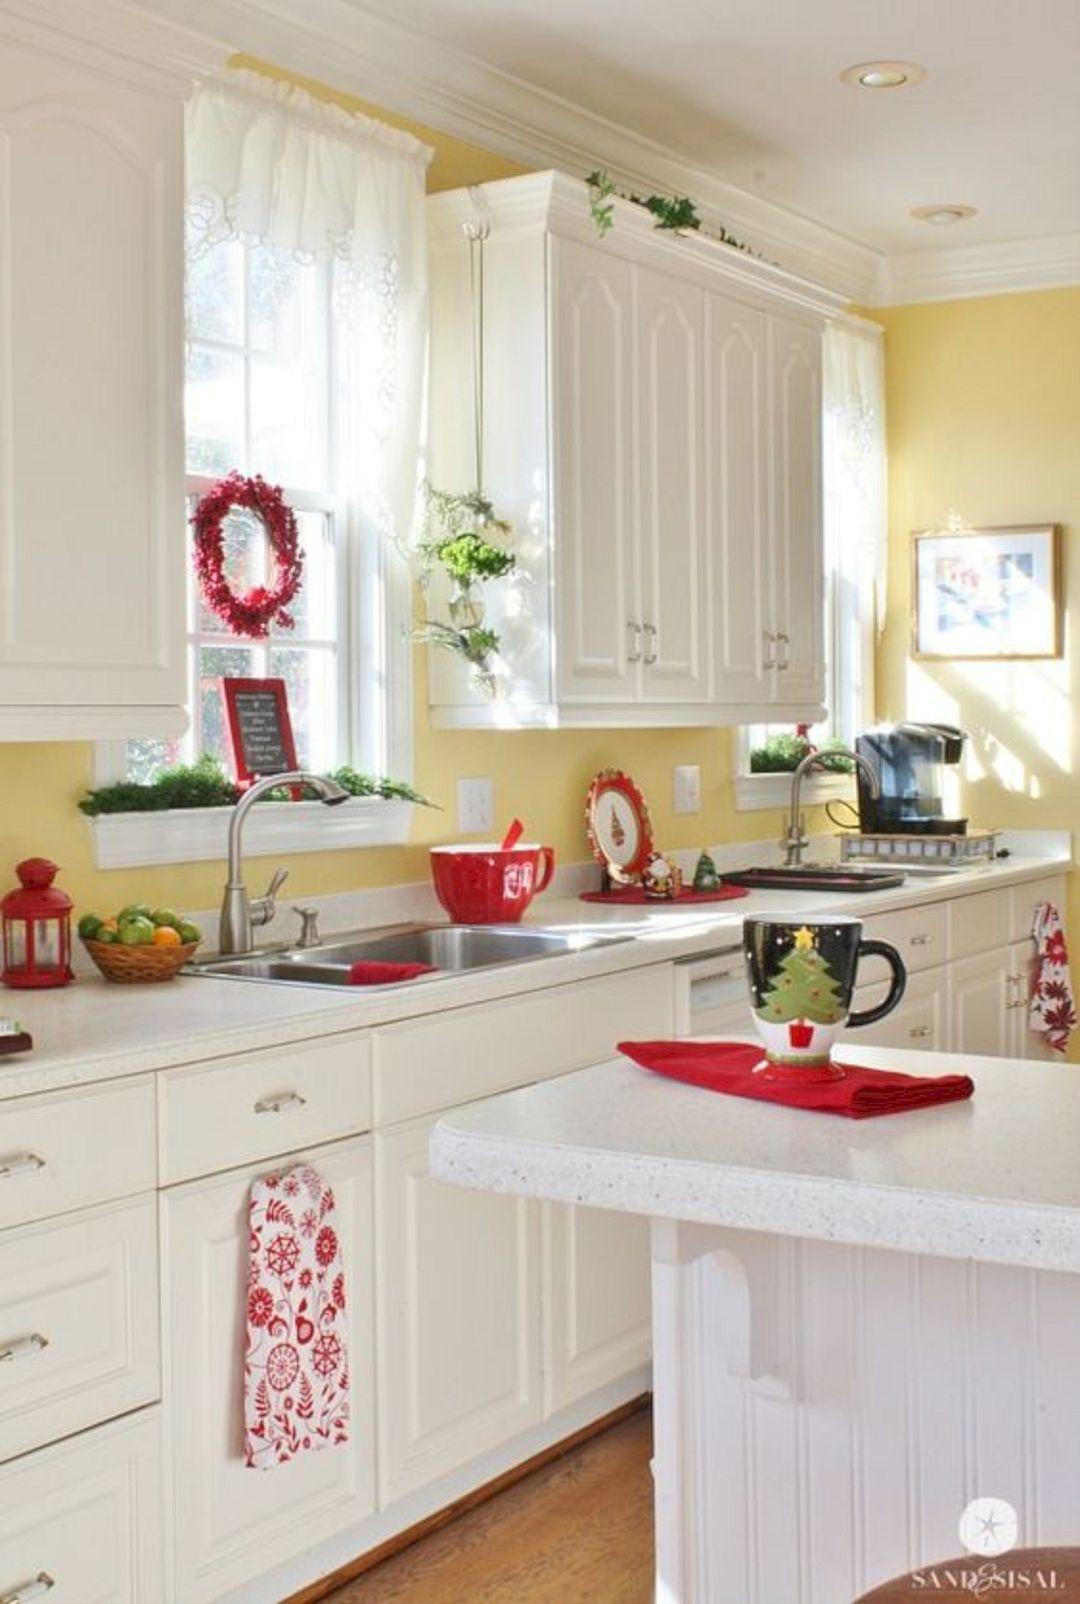 15 Gorgeous Yellow Kitchen Designs images